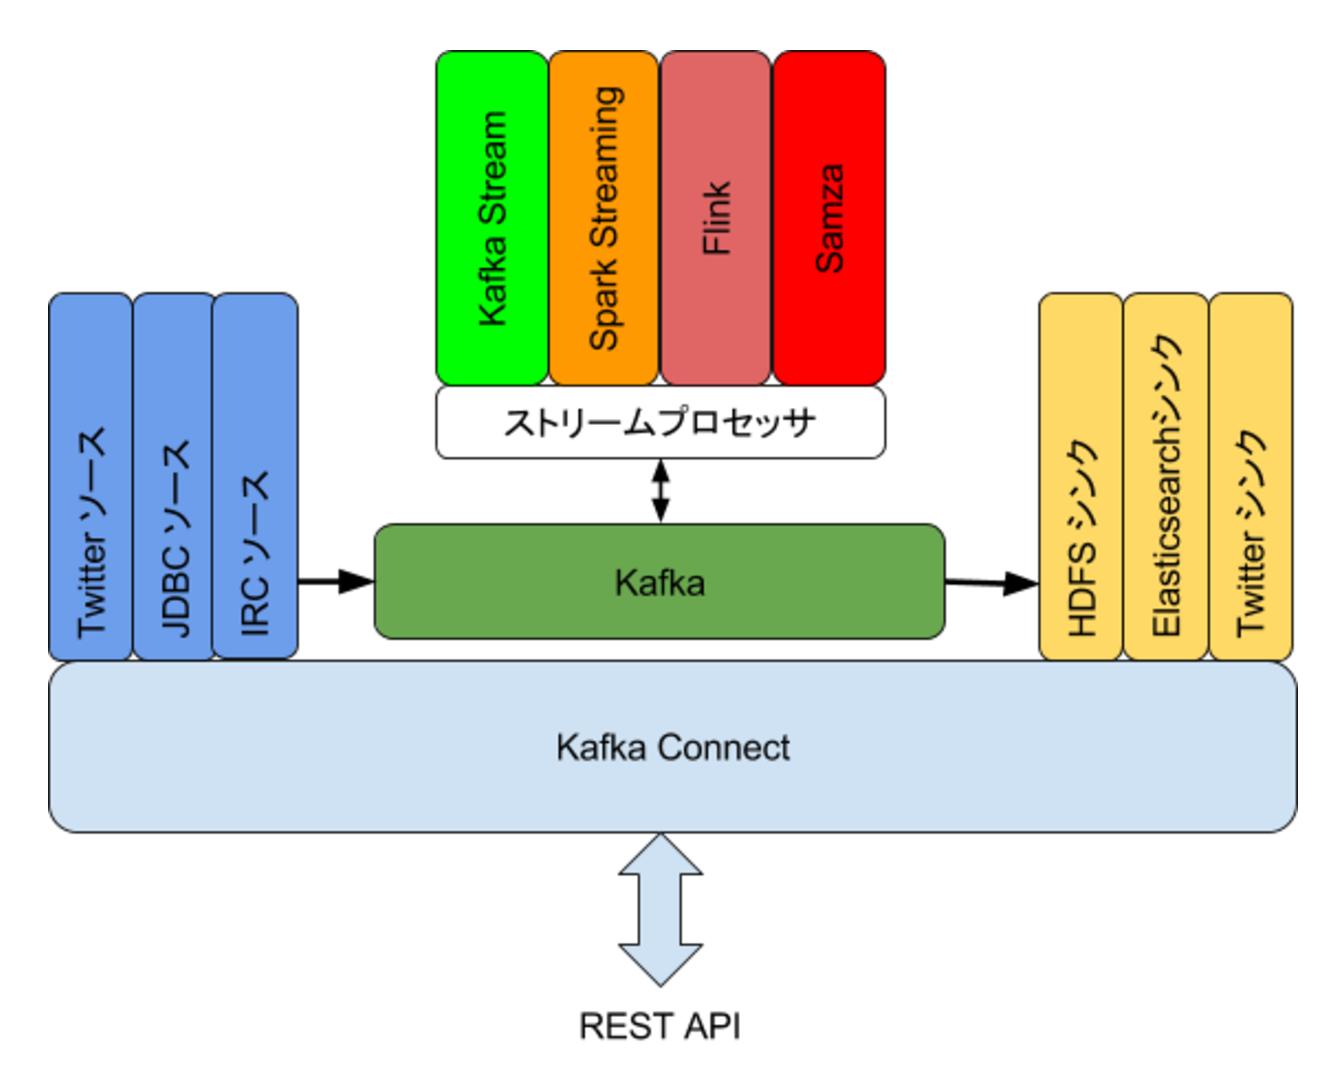 kafka-connect.png